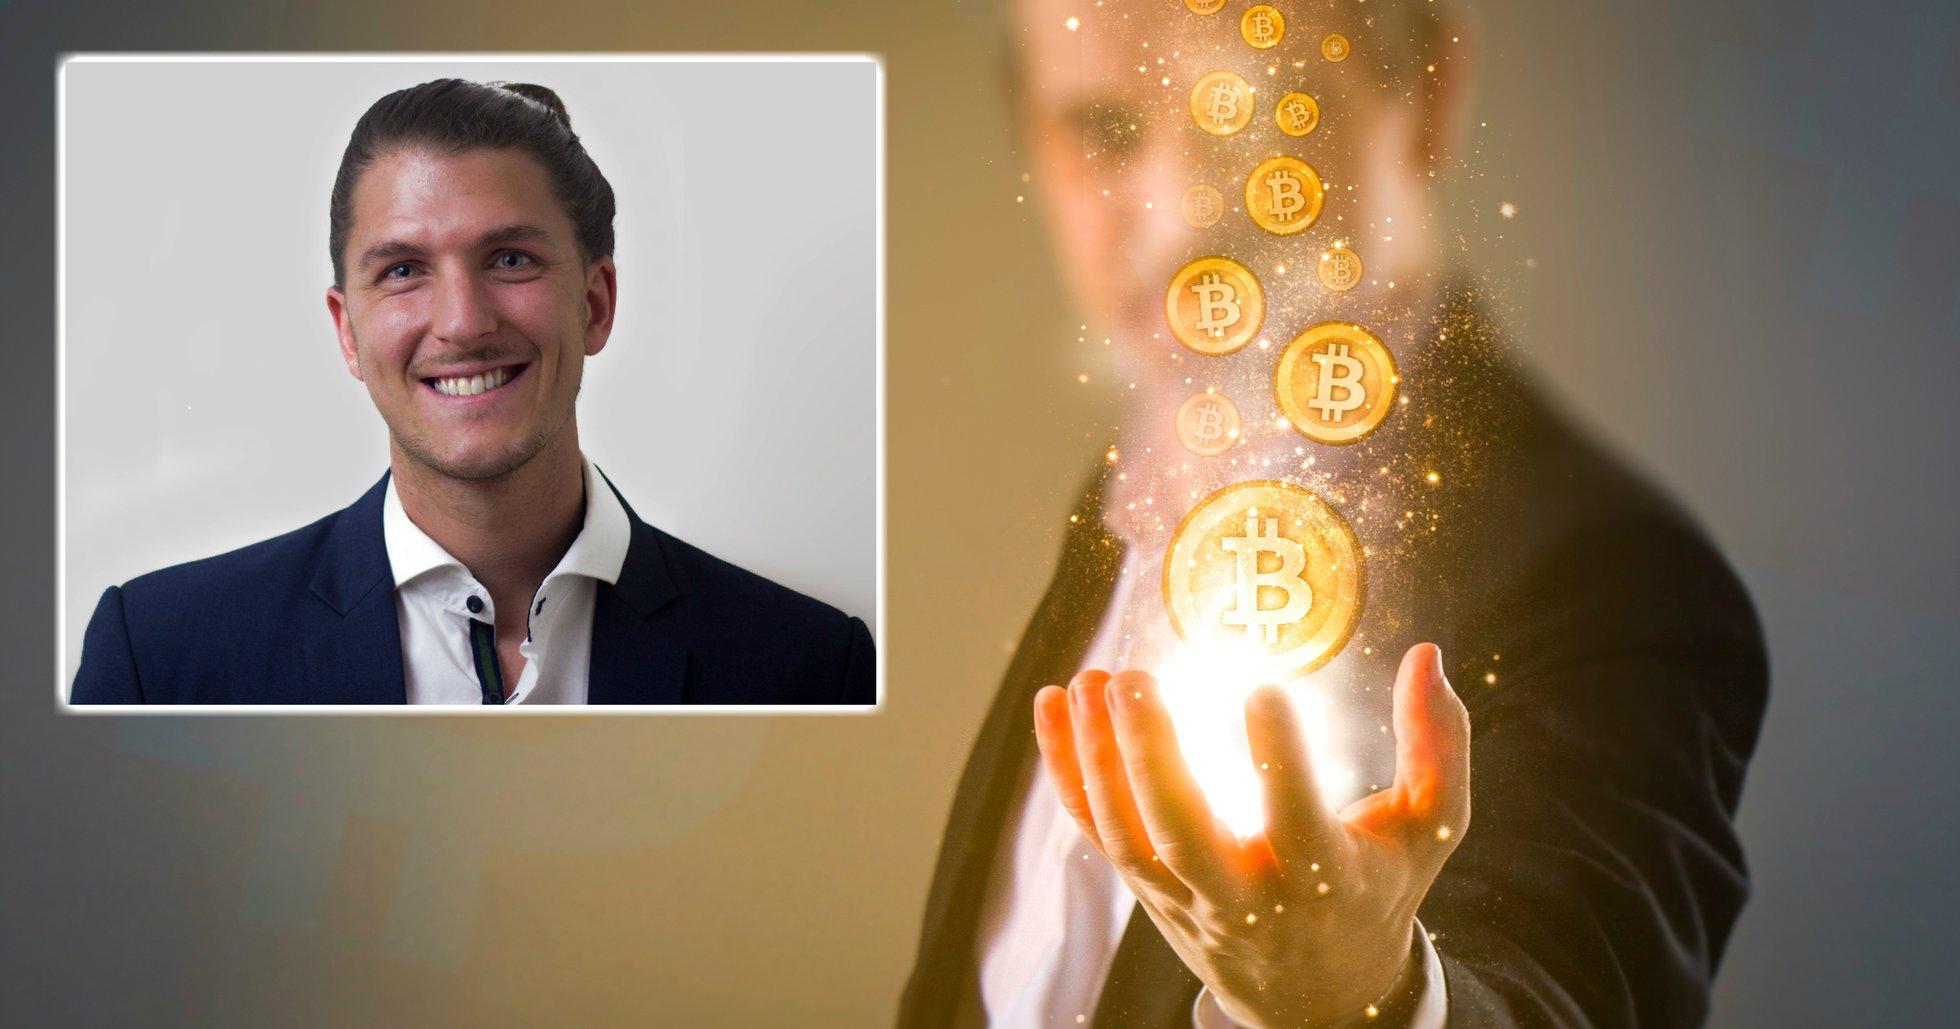 Veckans analys: Nu börjar bitcoinpriset återhämta sig.